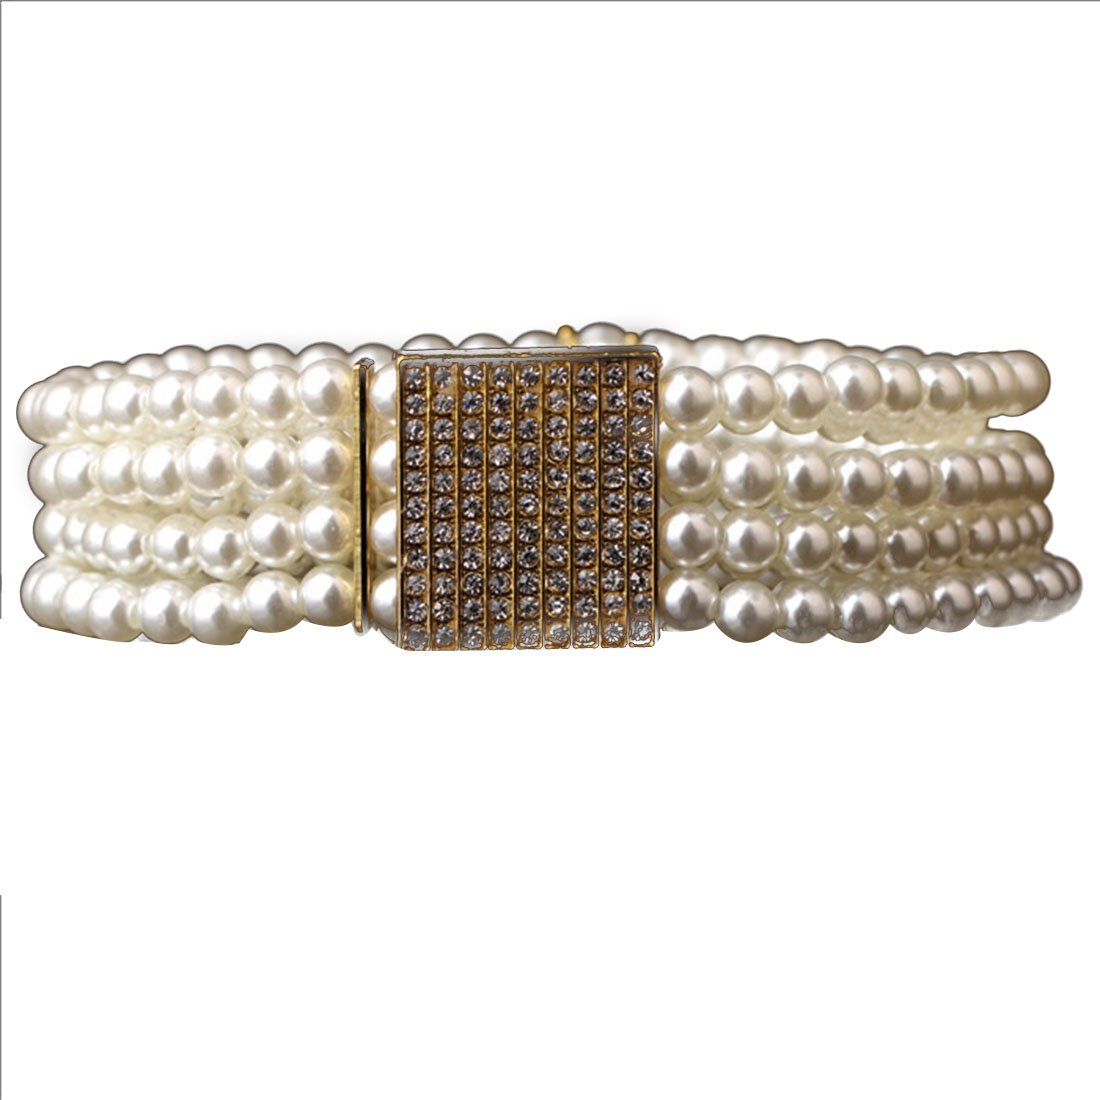 WomenS Small Gold Buckle Inlaying Rhinestone Pearl Elastic Belt Strap